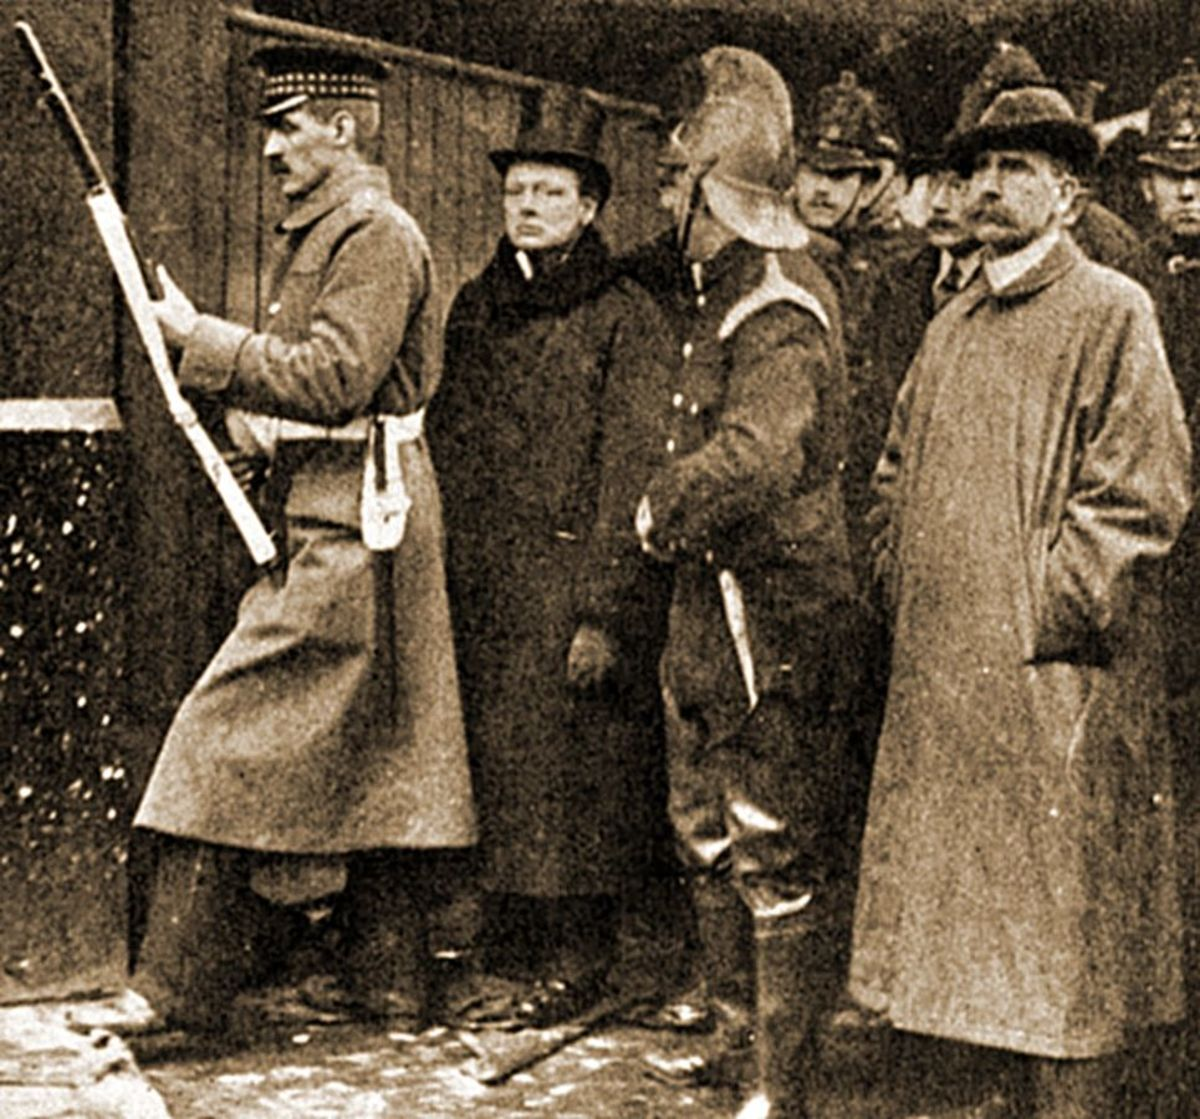 Winston Churchill at the scene.